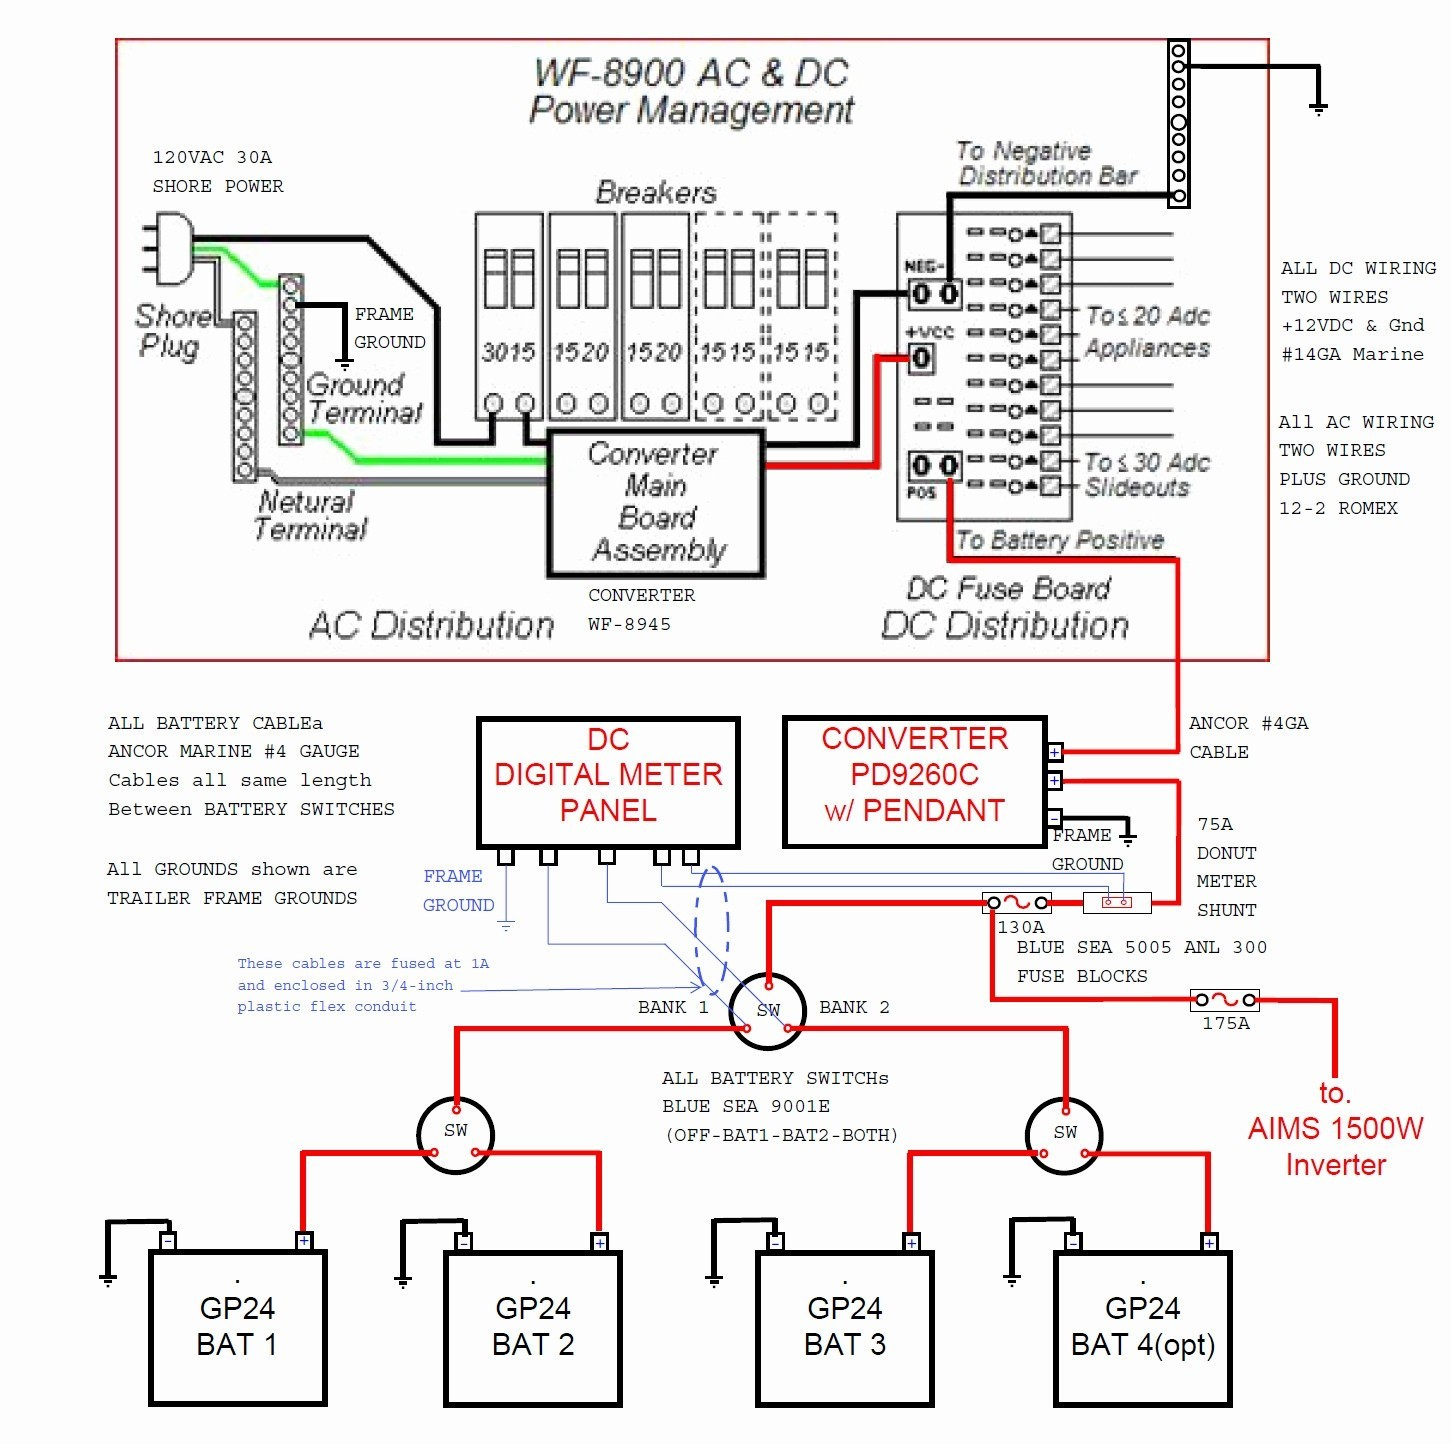 50 Amp Rv Plug Wiring Diagram Wiring Diagram 50 Amp Plug New 50 Amp Wiring Diagram Reference Amp Of 50 Amp Rv Plug Wiring Diagram